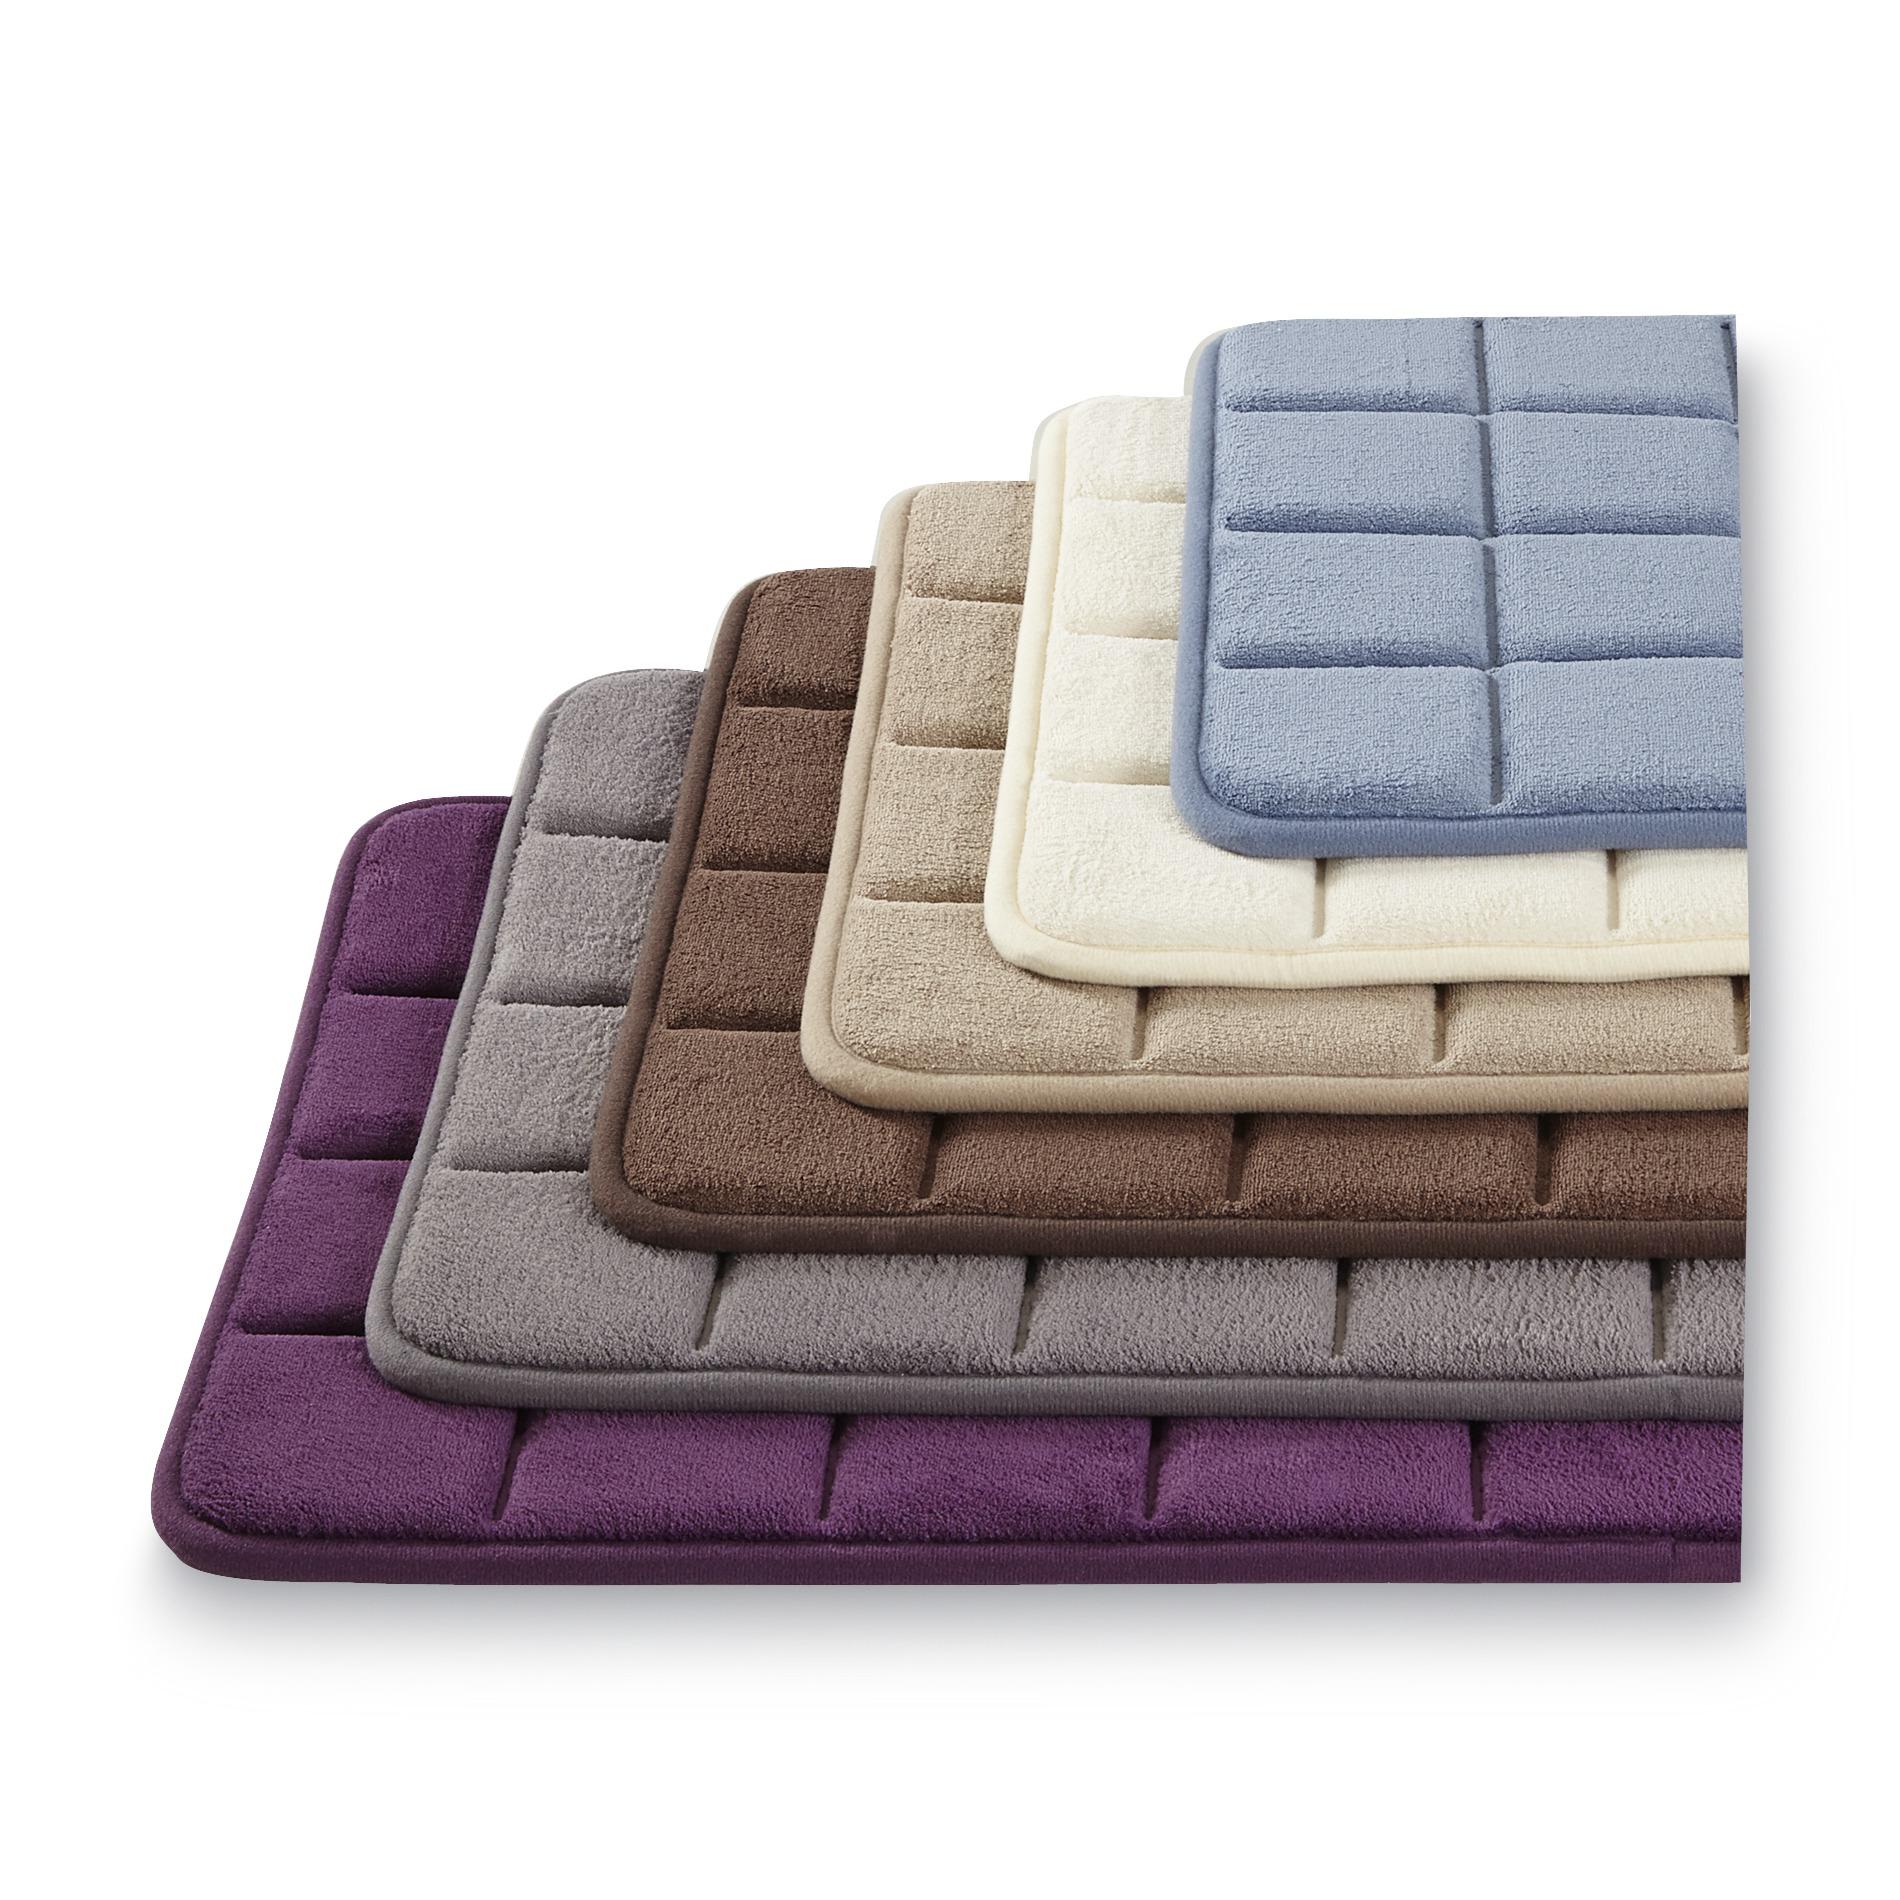 Sunham Memory Foam Bath Mat - Windowpane Home Bed & Towels Rugs